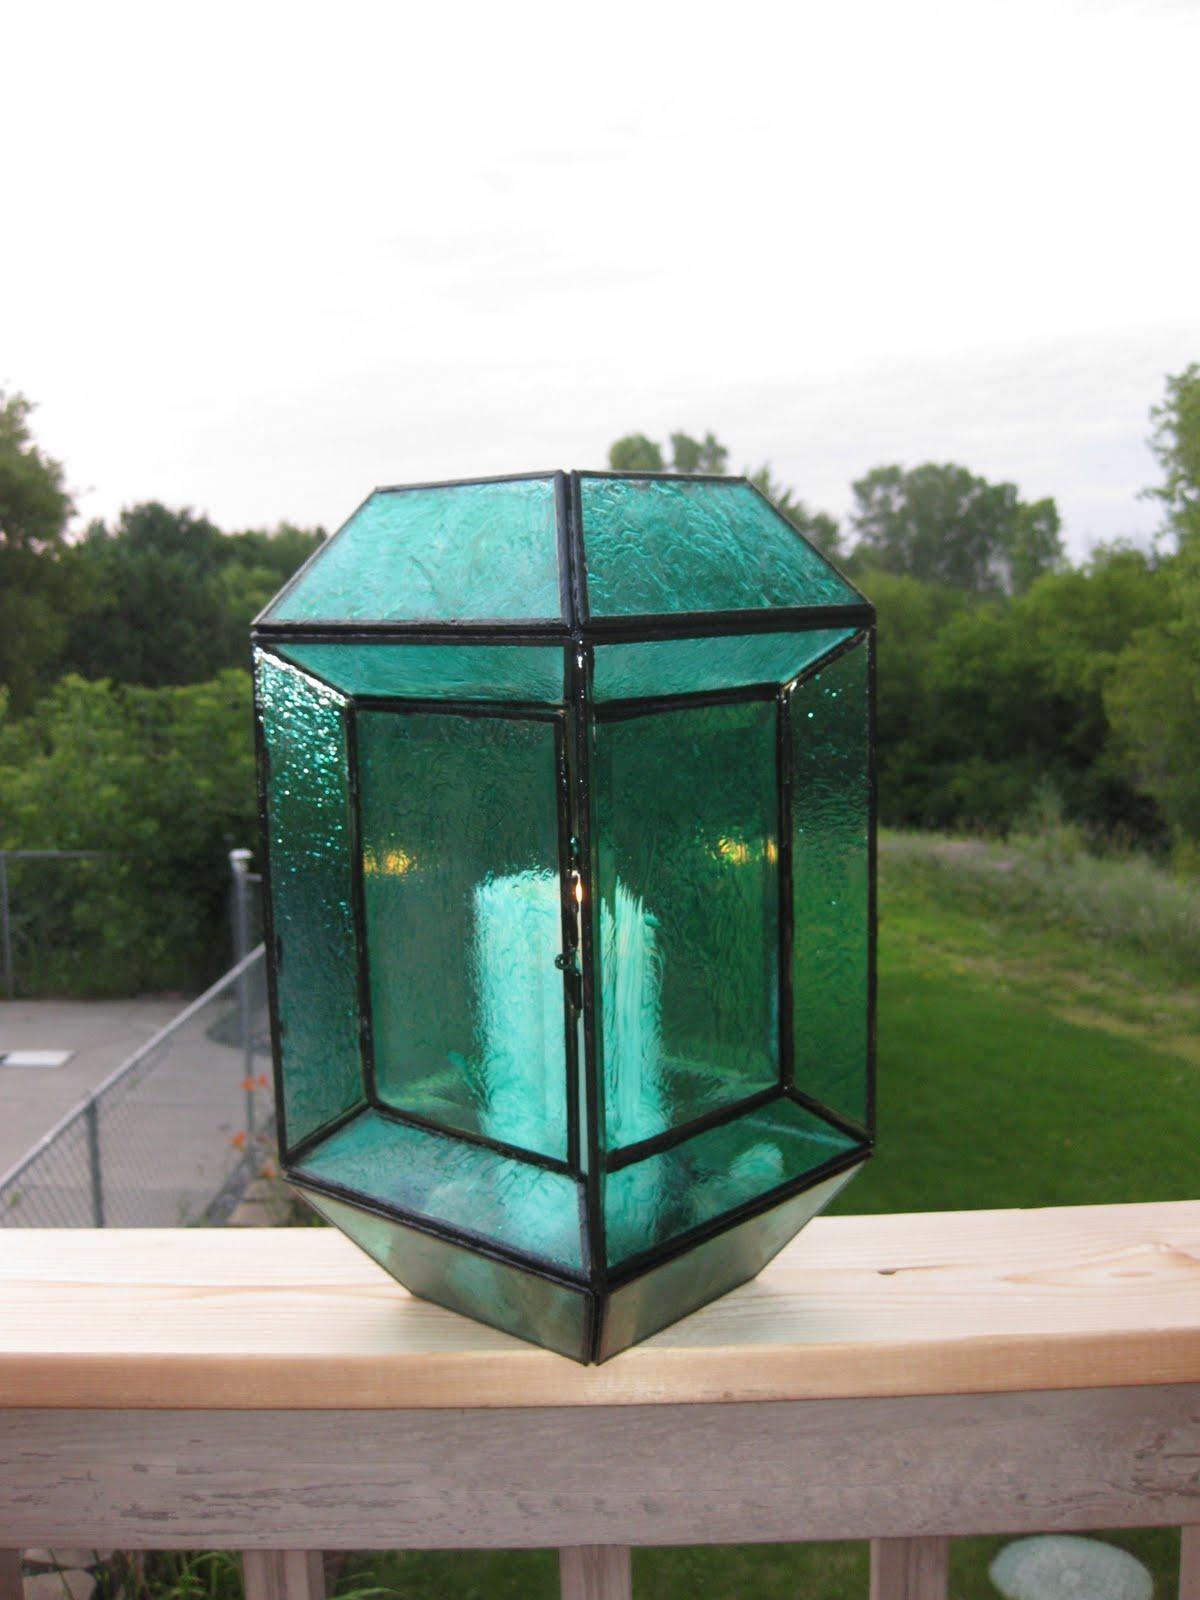 mod podge gekleurd glas